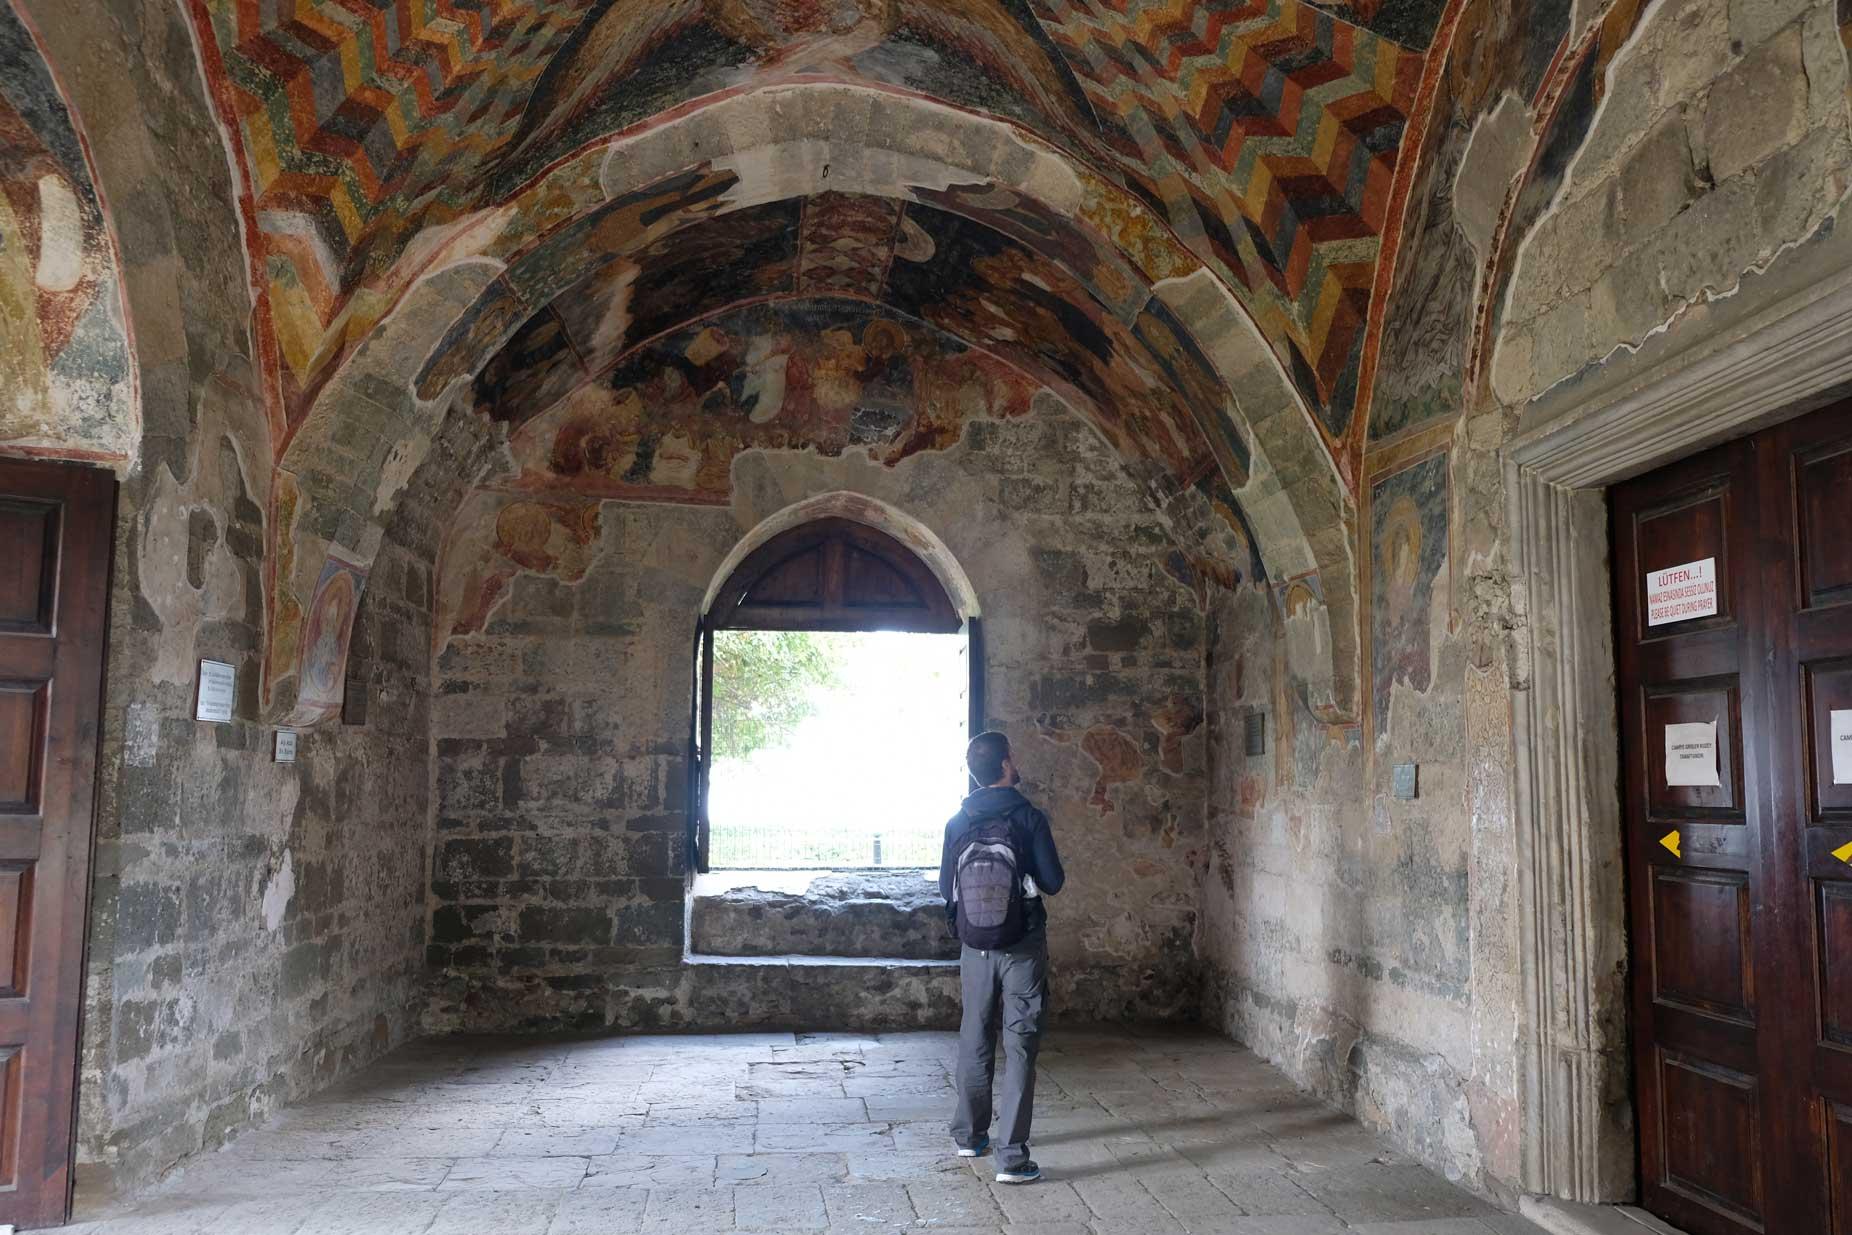 Sebastian sieht sich Fresken in der Hagia Sophia an